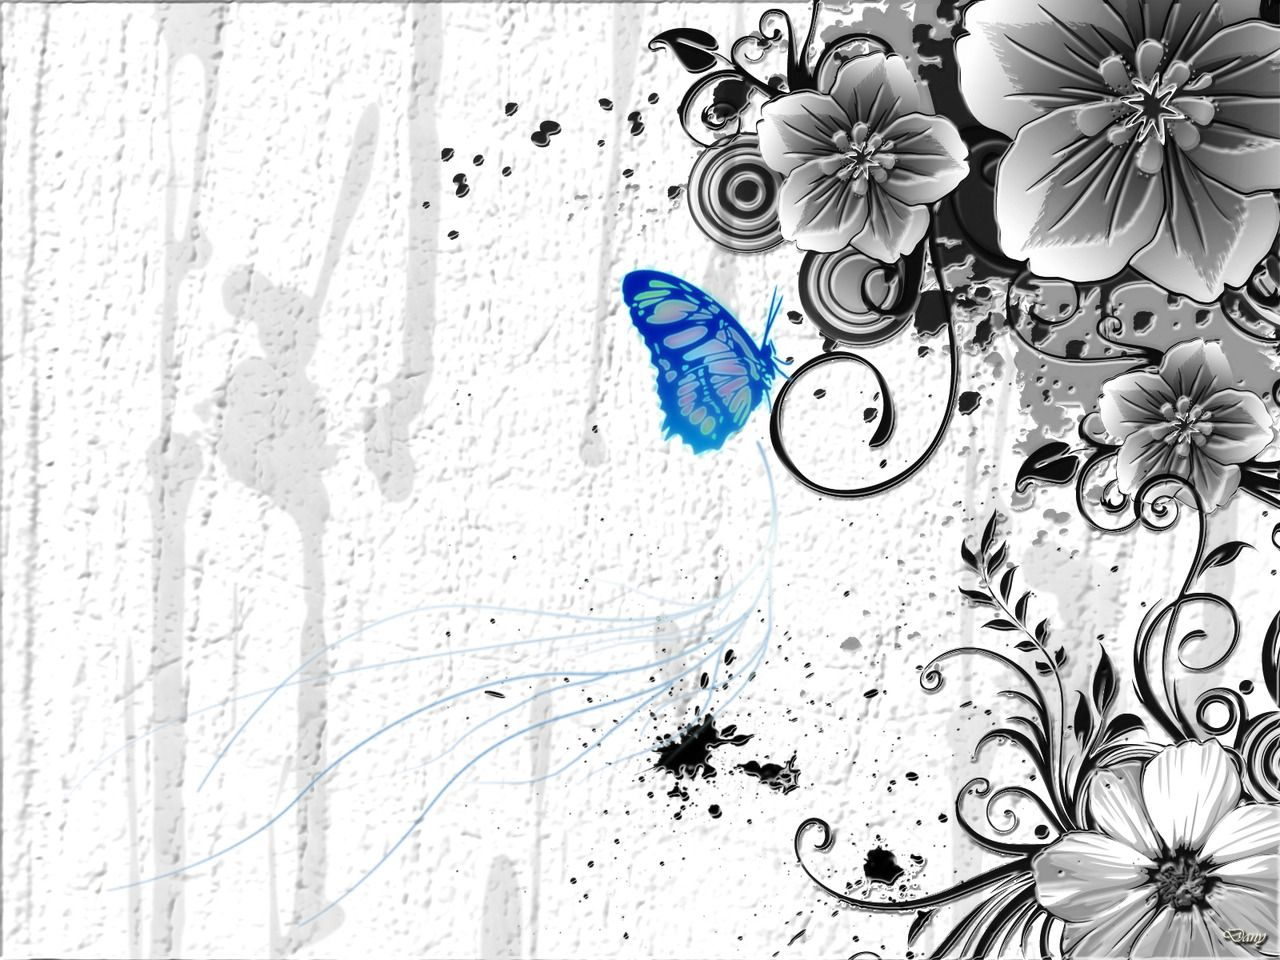 Fondos Vintage Vectores Gratis En Hd Gratis Para Descargar 4 Papel Pintado De Mariposa Papel Tapiz Abstracto Fondo De Arte